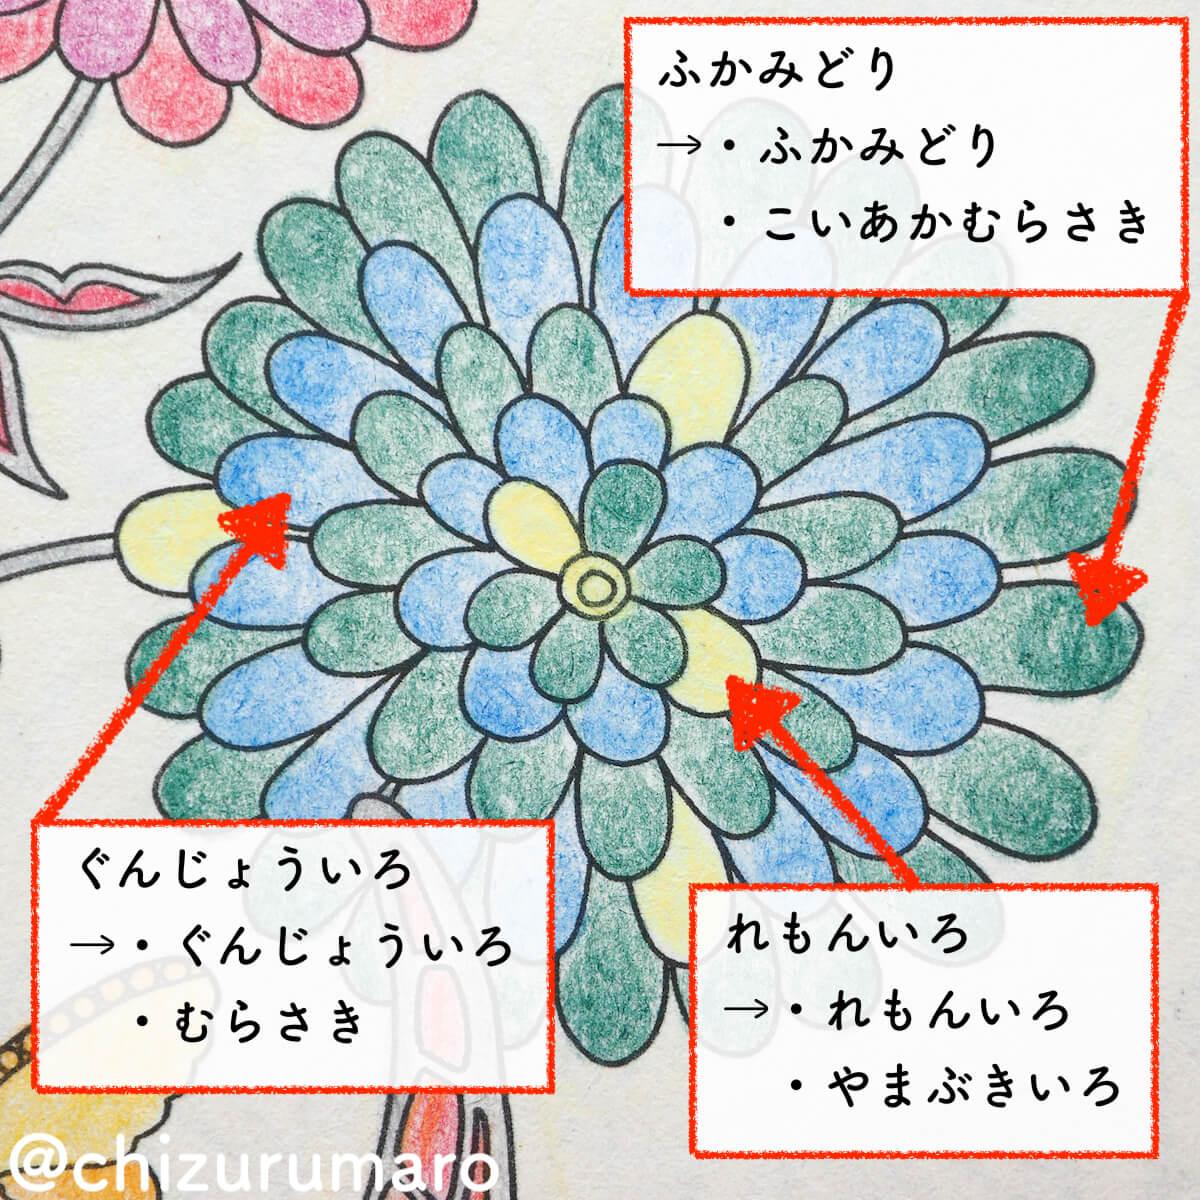 f:id:chizurumaro:20200430150311j:plain